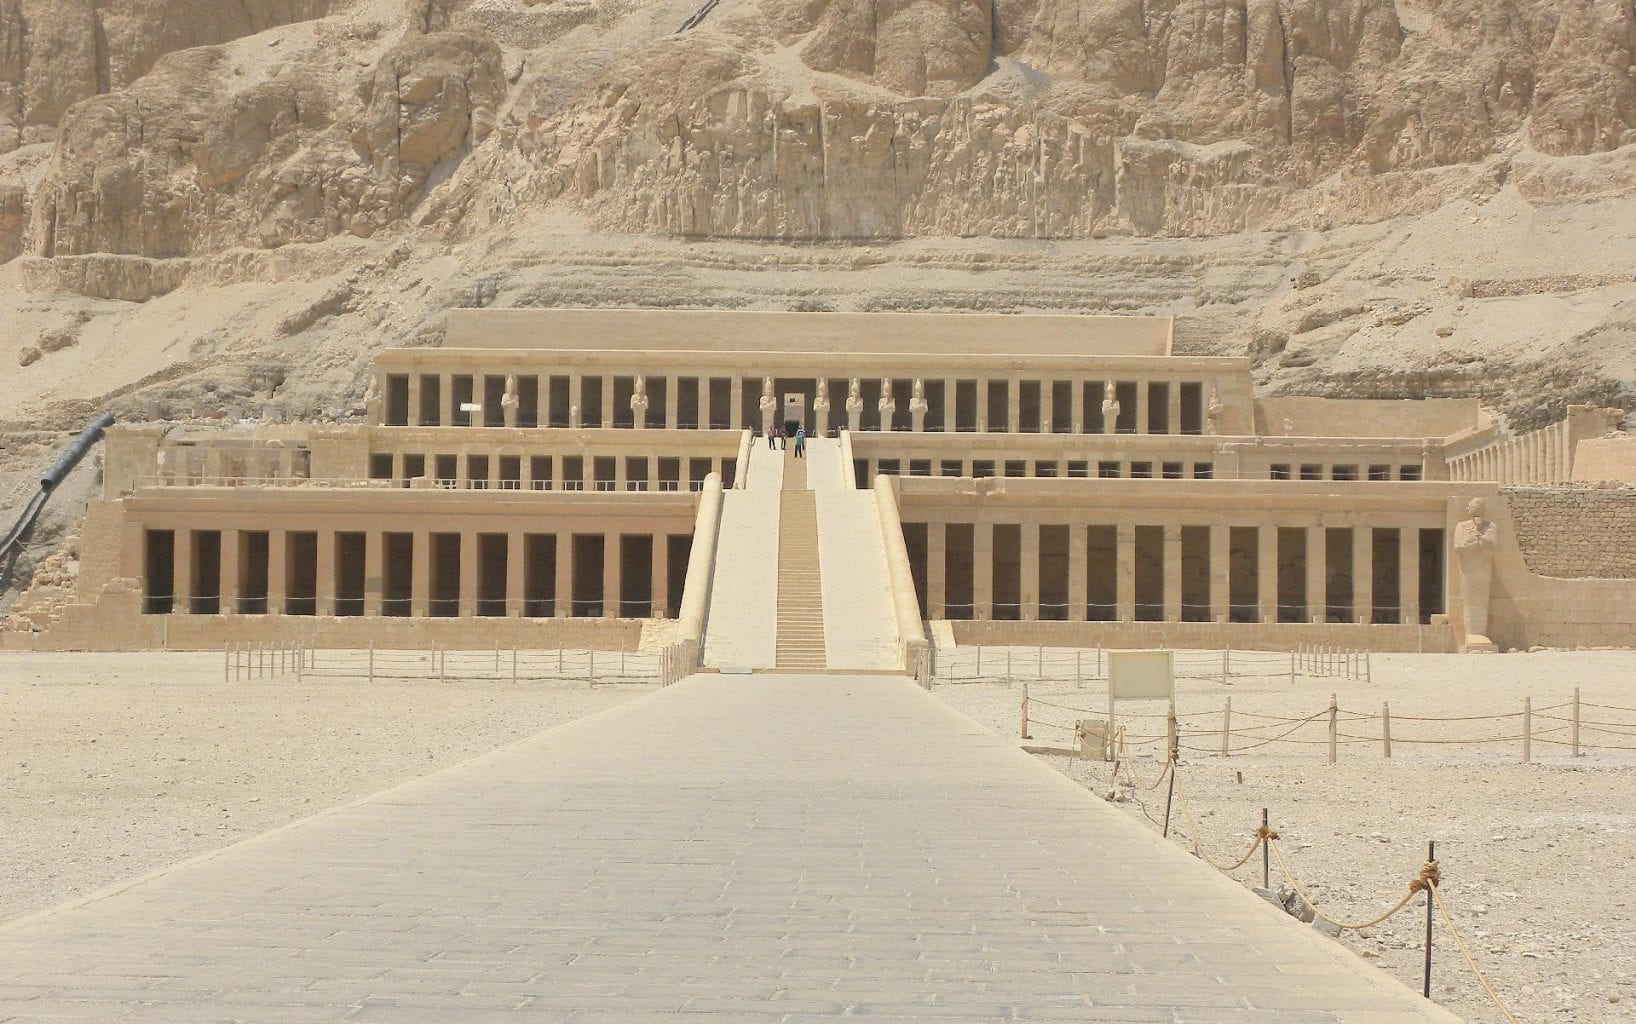 The Mortuary Temple of Hatshepsut. Credit: Jumpstory